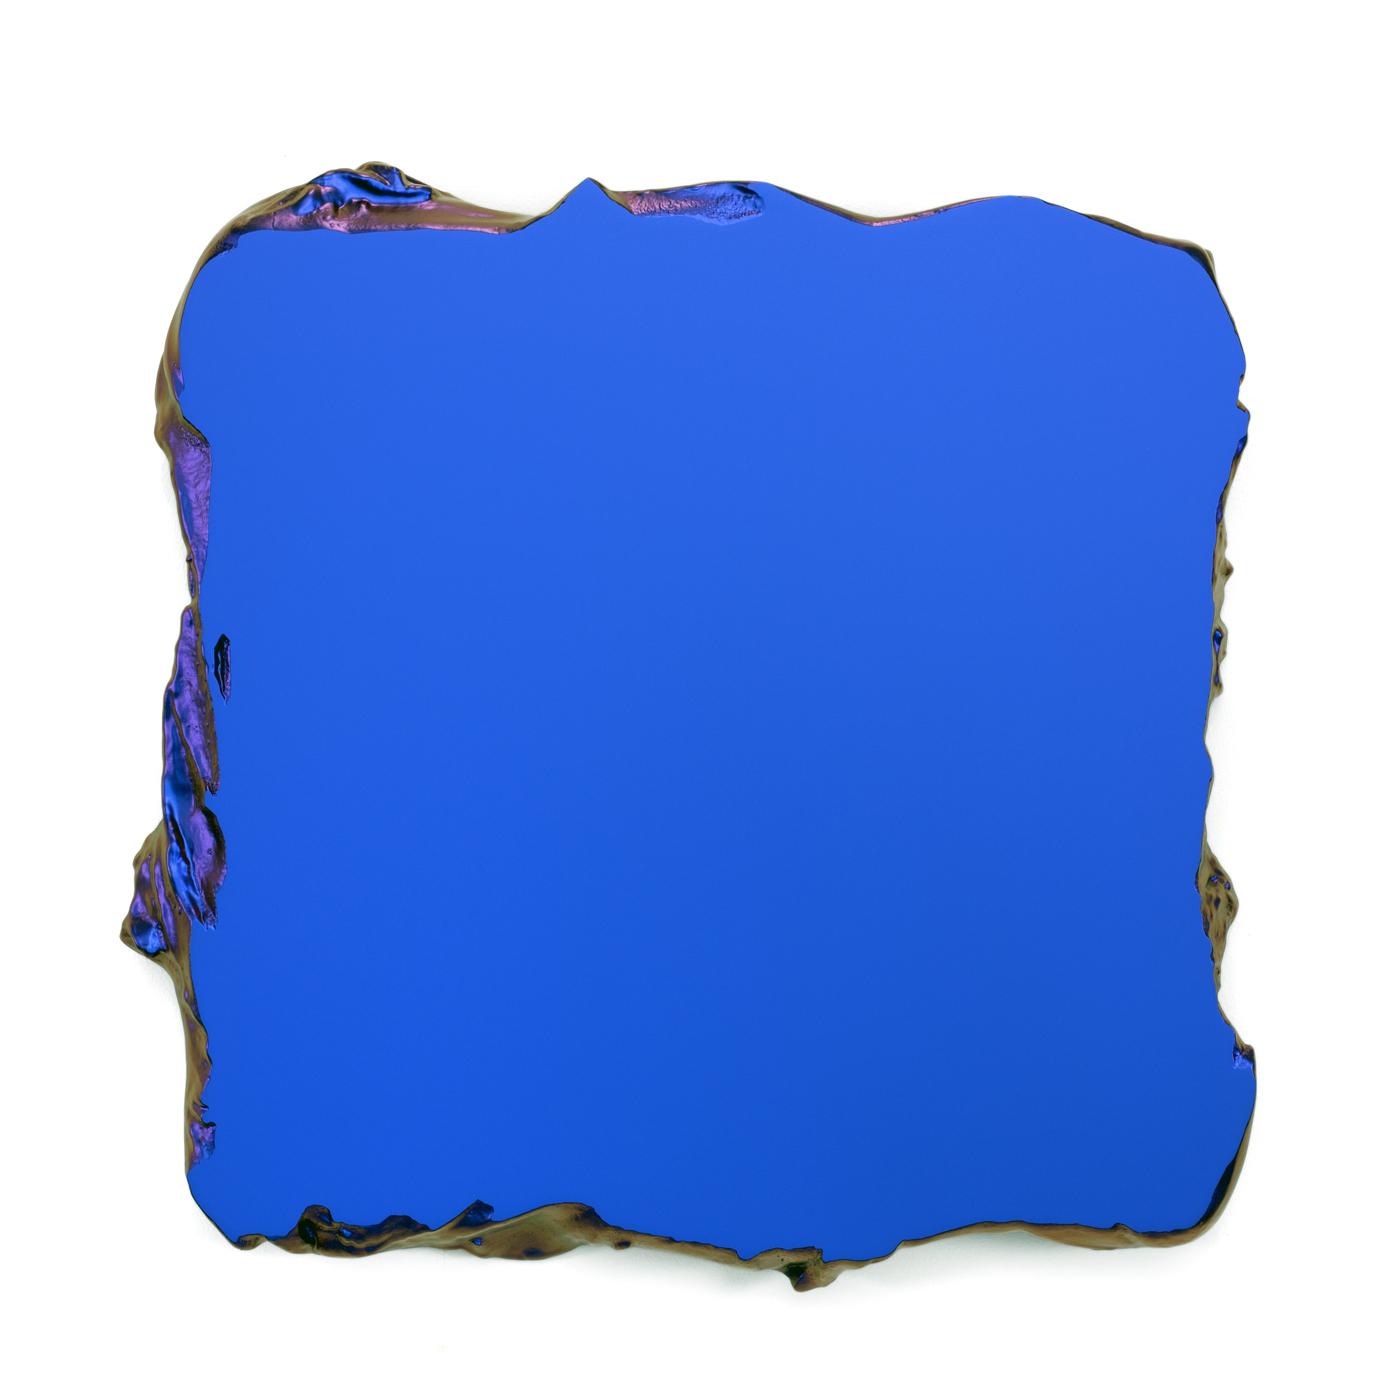 Juri Markkula Blue to Red 50x50cm Interference pigment, polyurethan